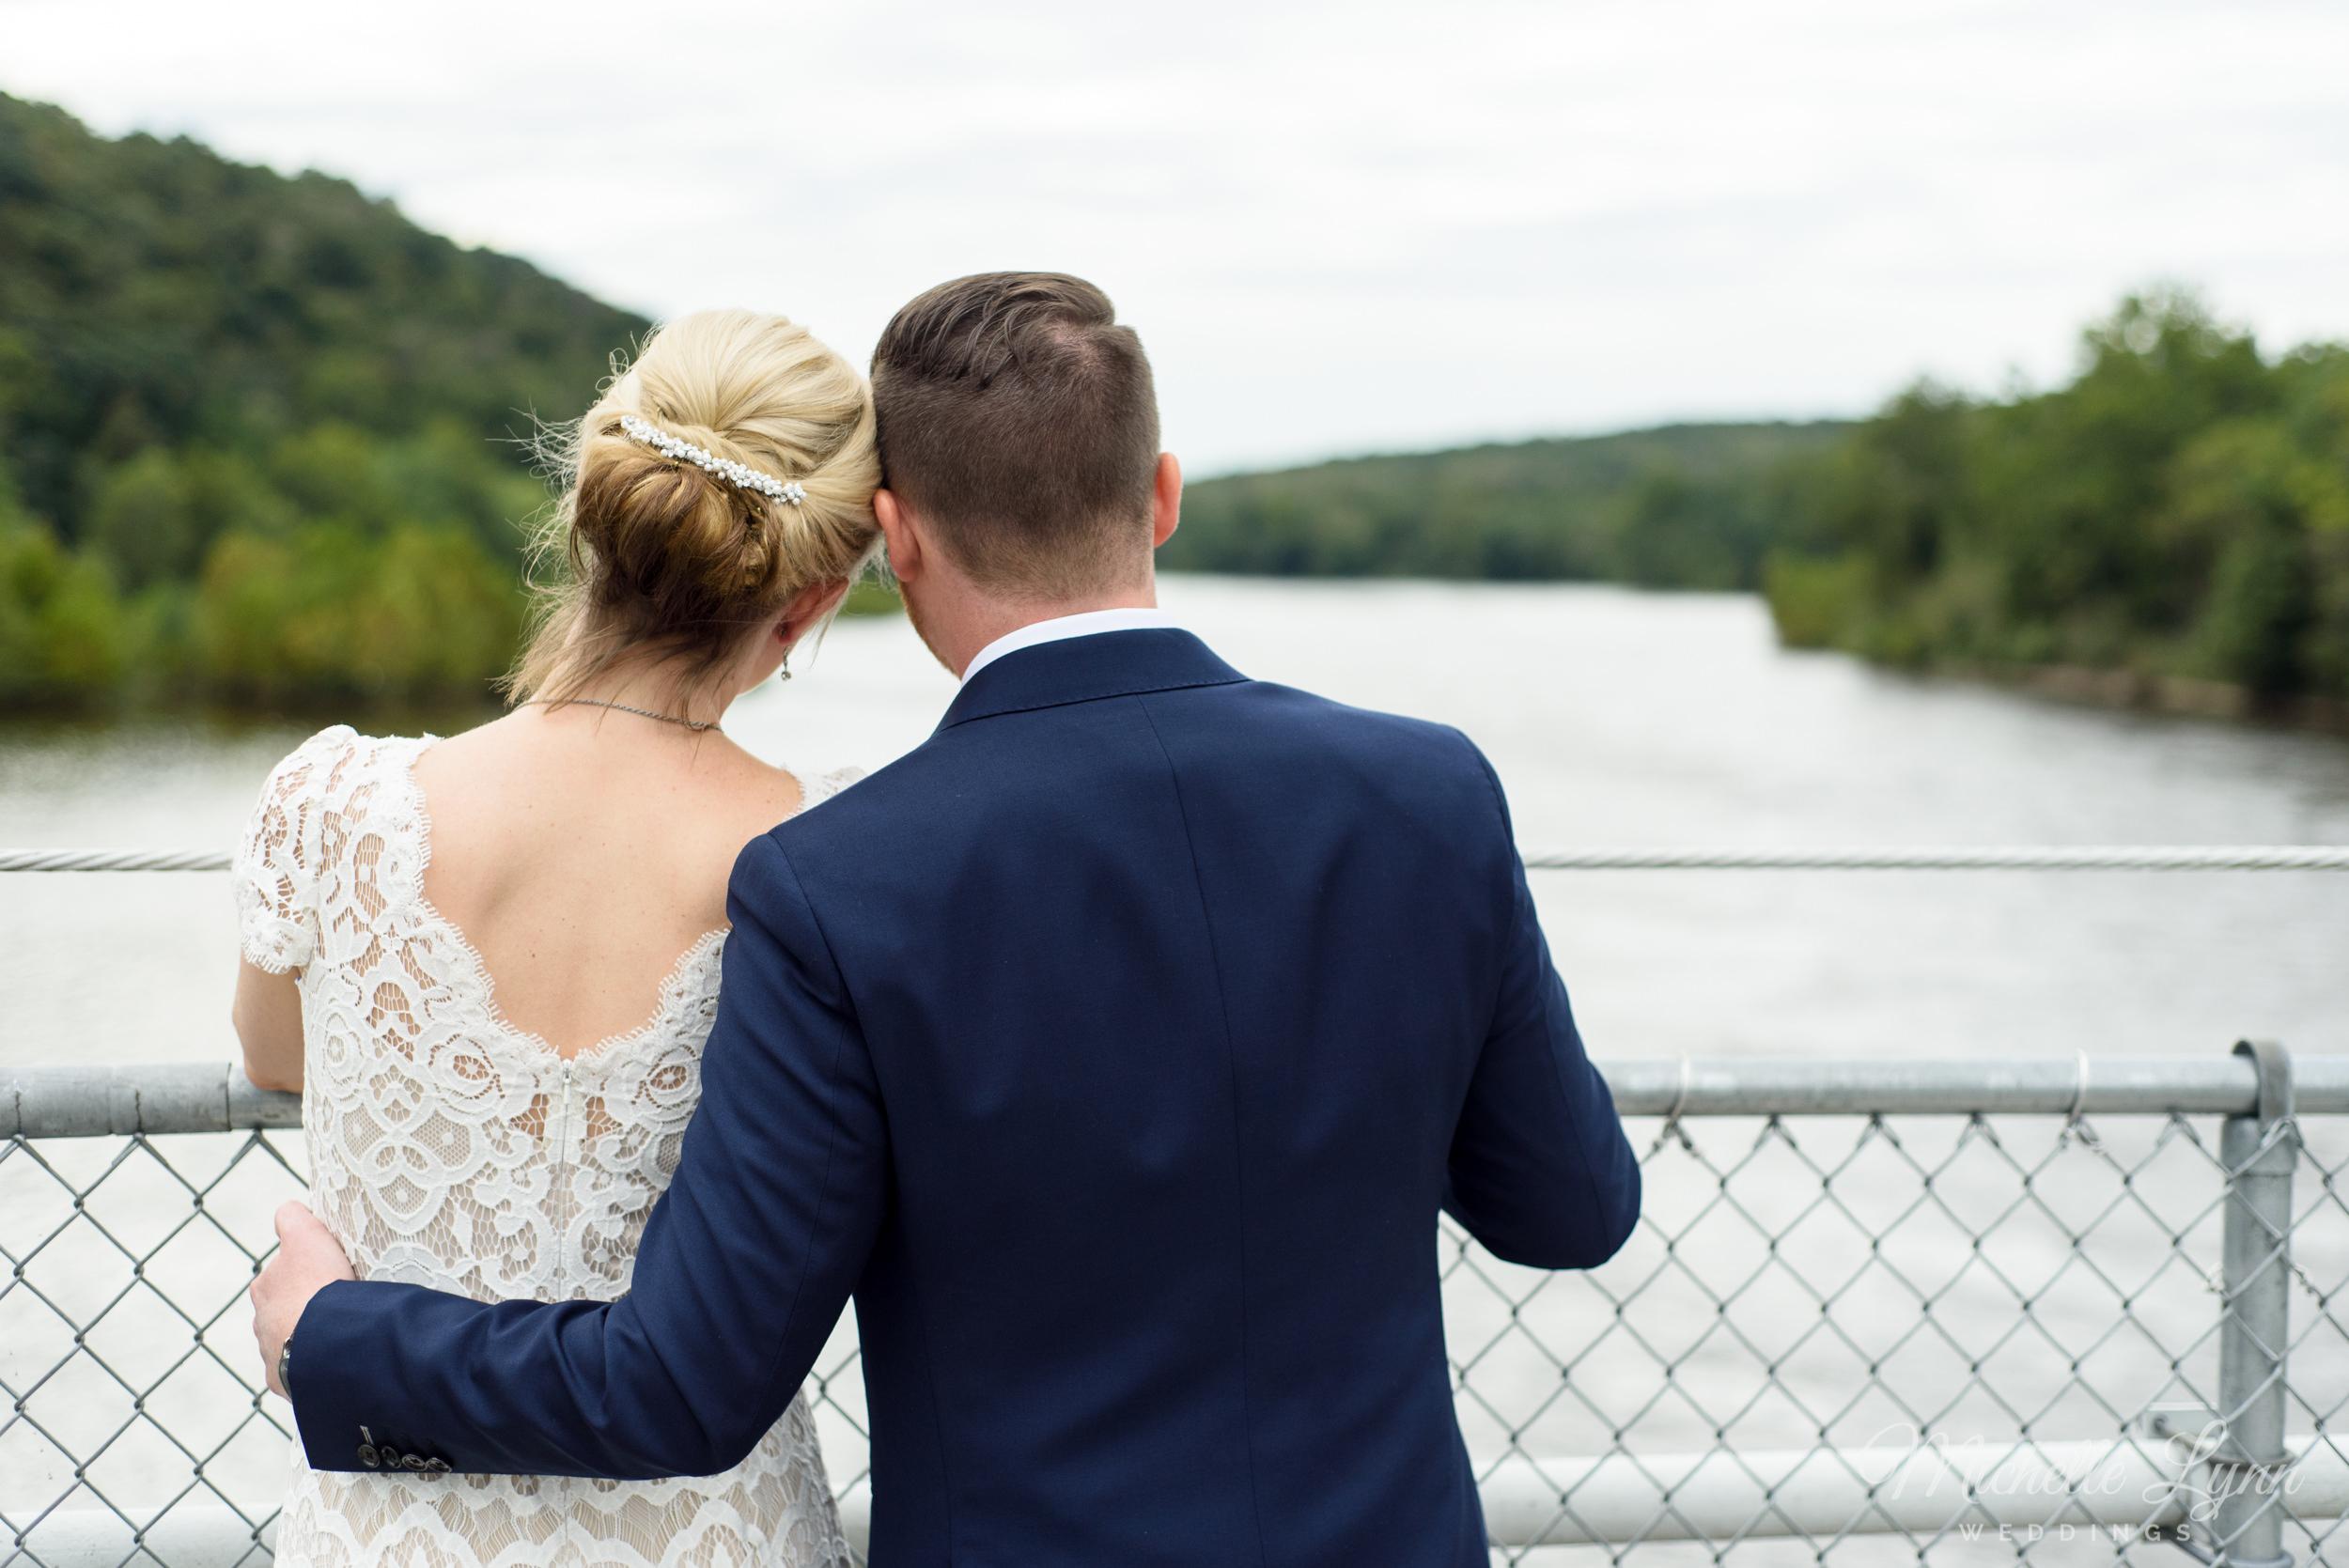 mlw-lumberville-general-store-new-hope-wedding-photographer-15.jpg